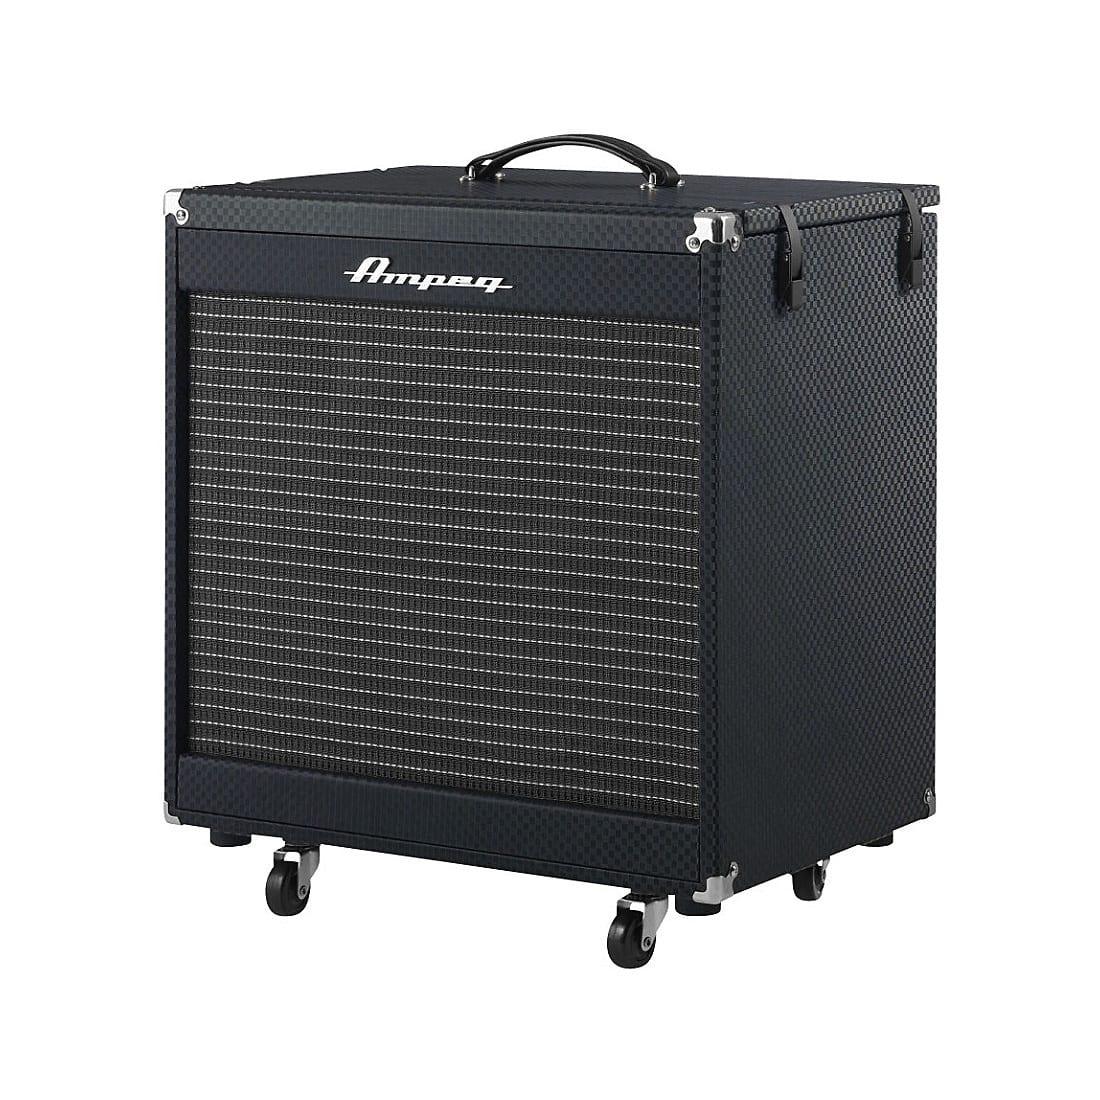 ampeg portaflex pf210he bass cabinet 450 watts 2x10 reverb. Black Bedroom Furniture Sets. Home Design Ideas